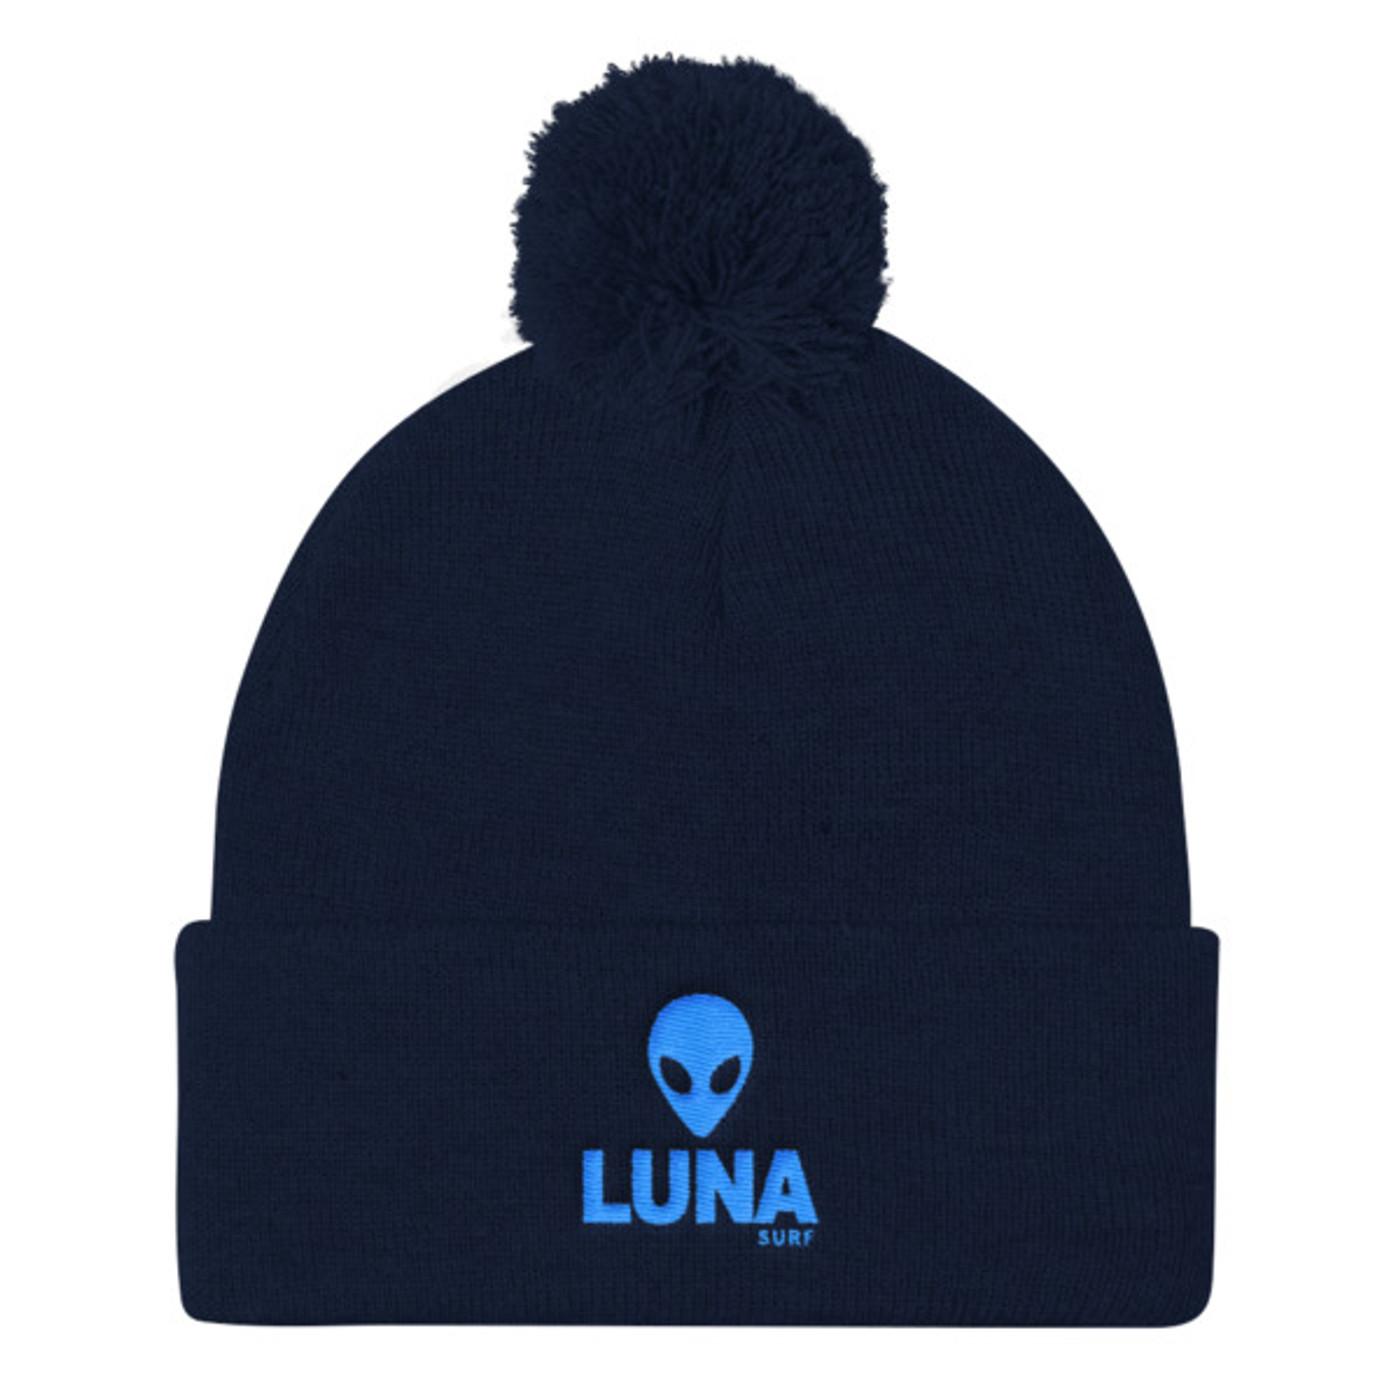 Alien Blue Pom Pom Knit Cap